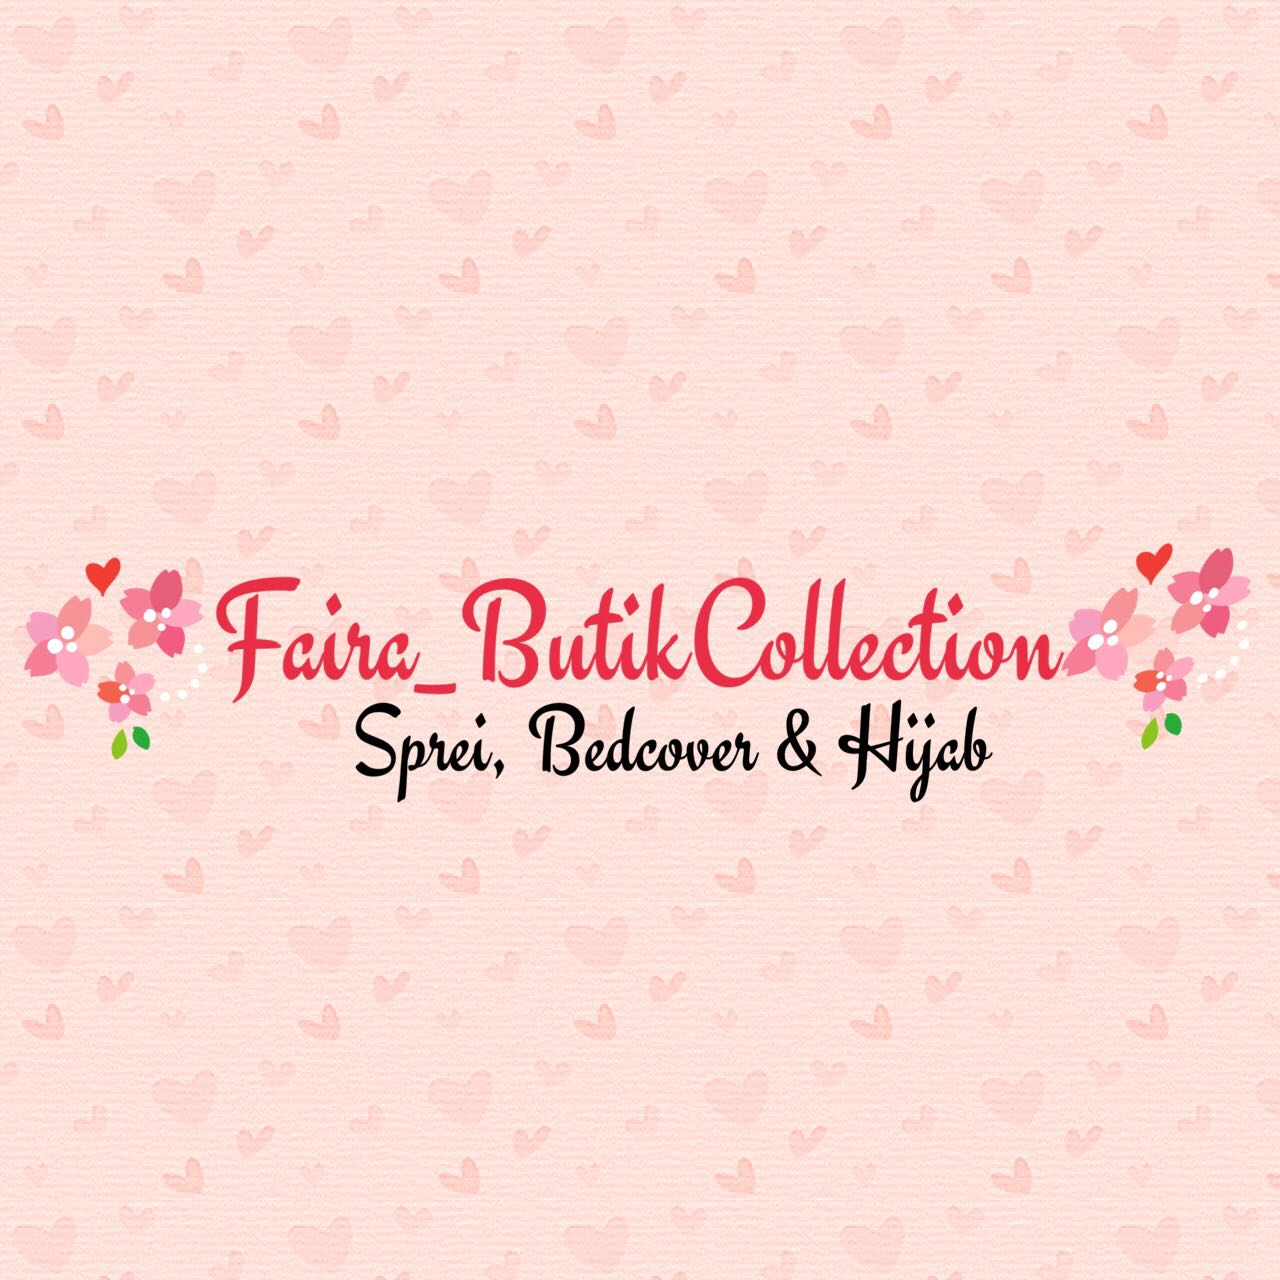 faira_boutique